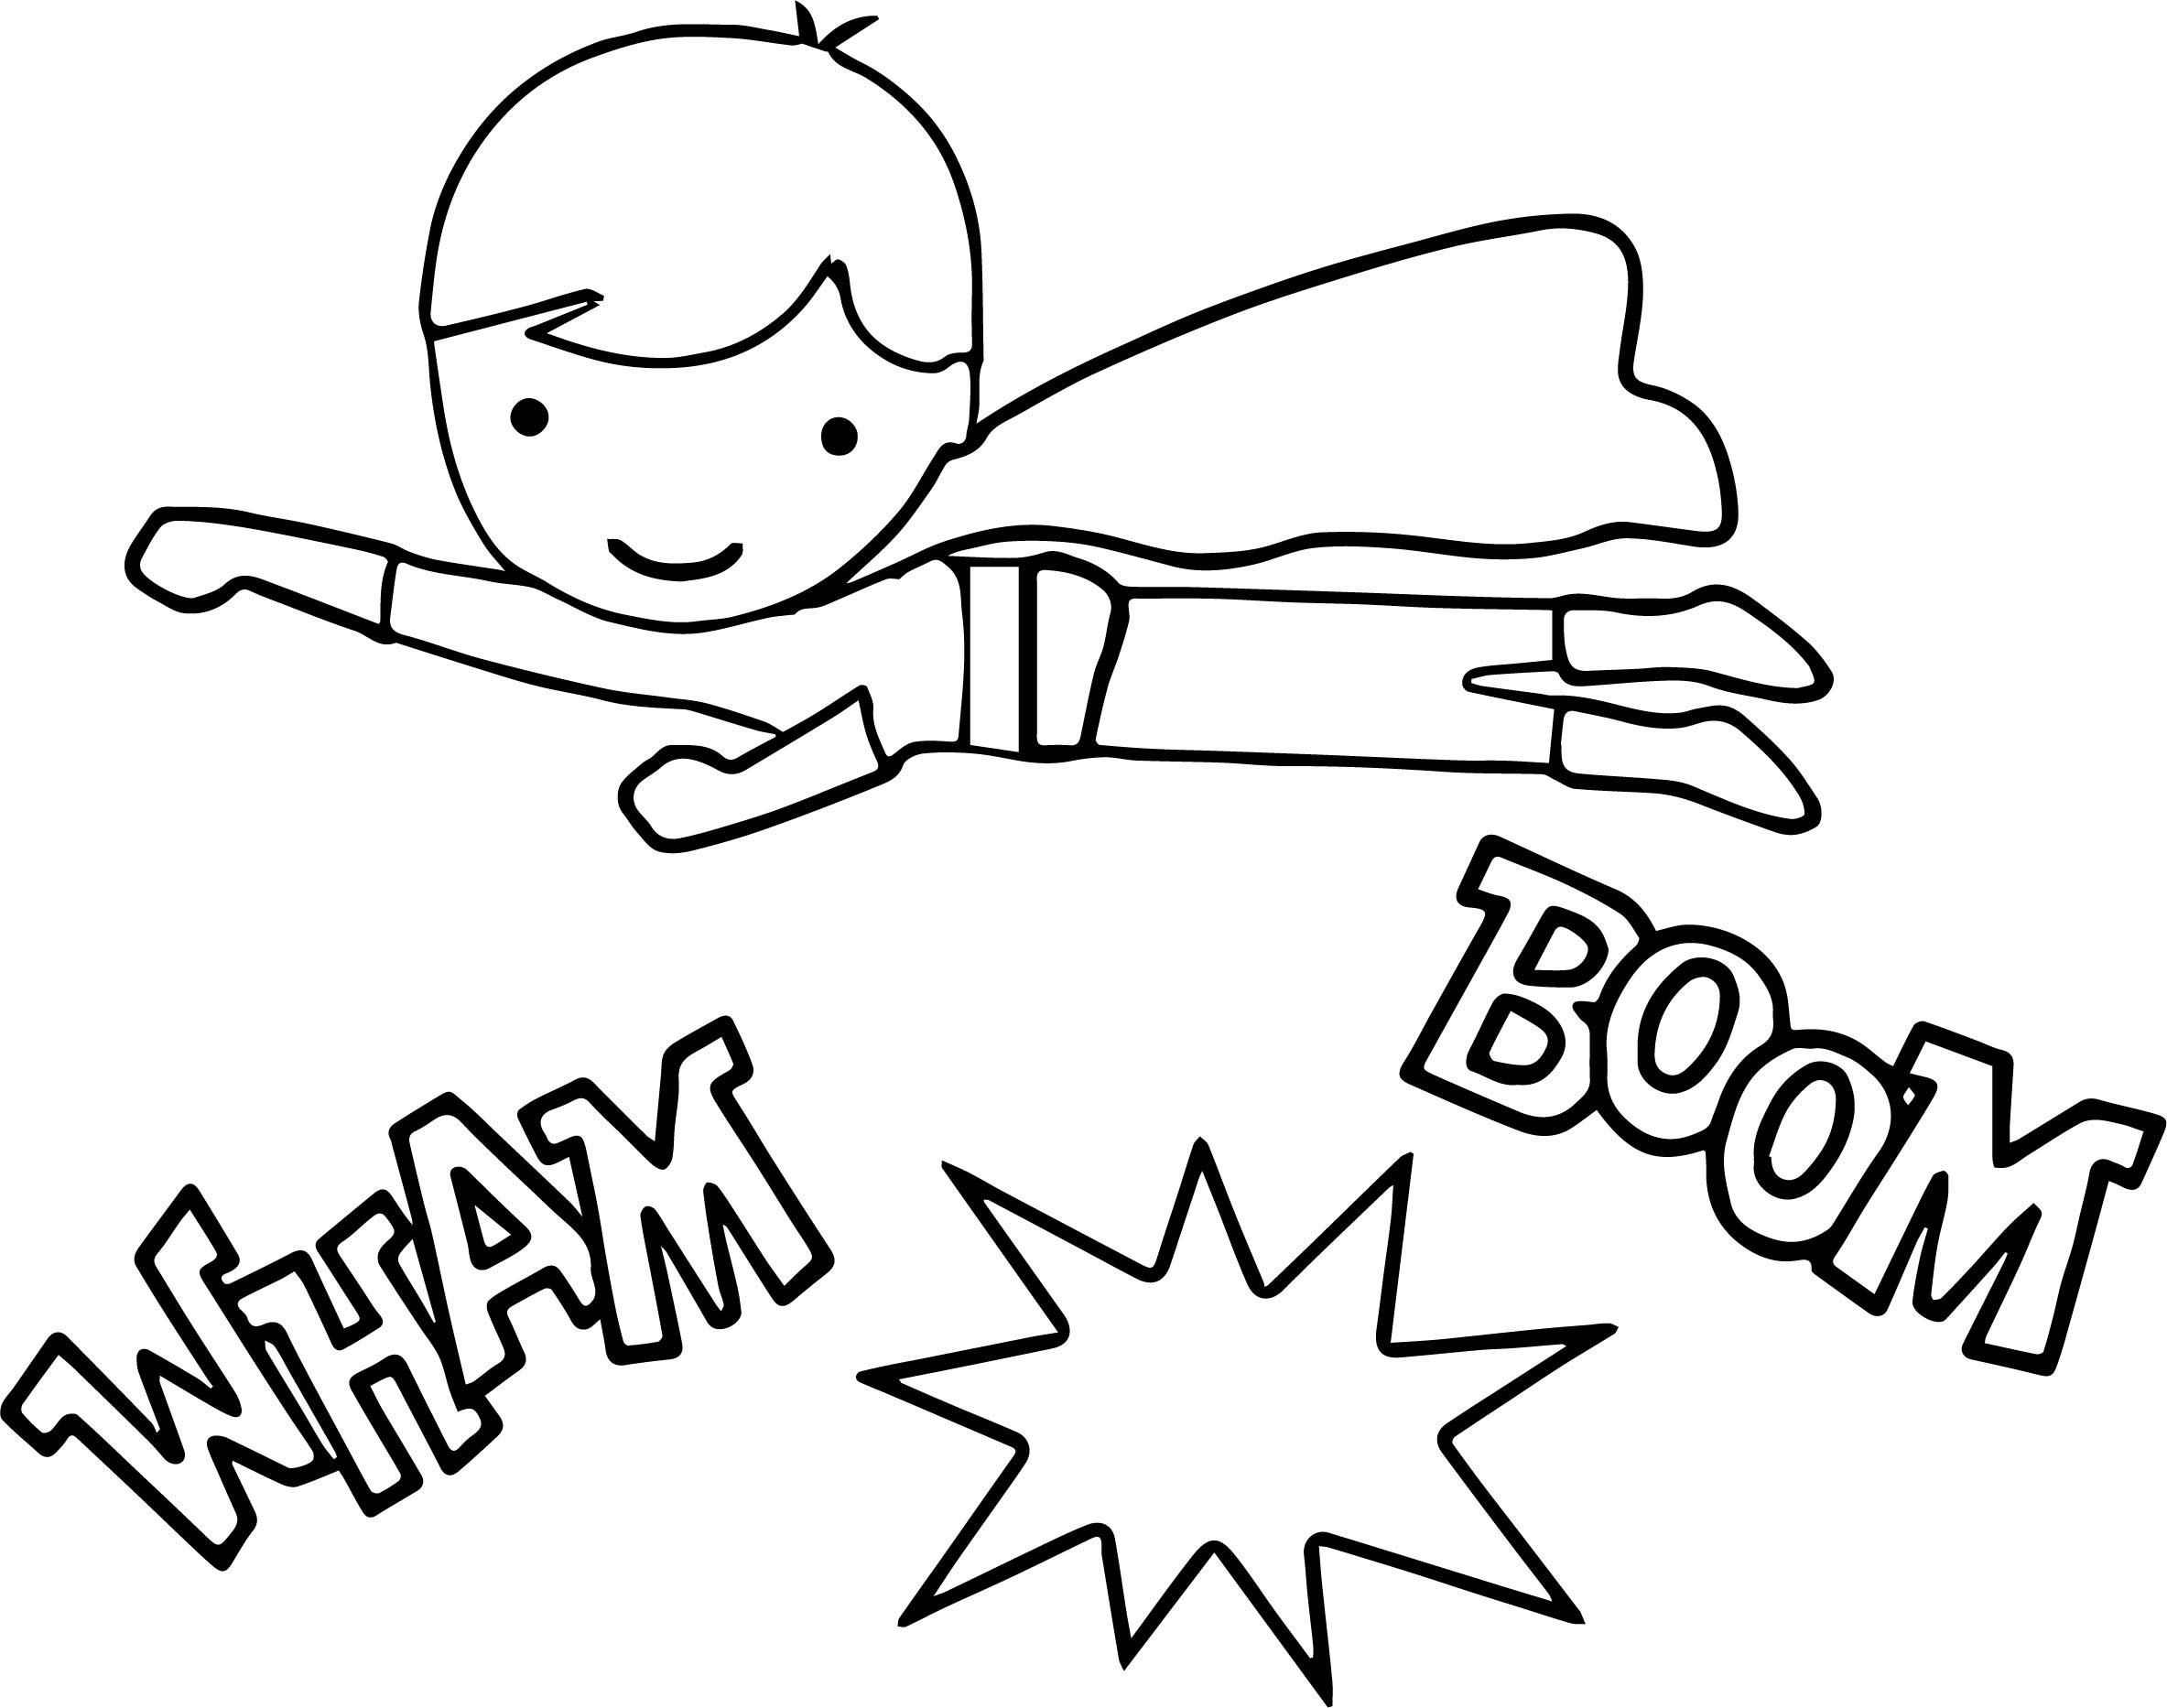 Kid Superhero Drawing at GetDrawings.com | Free for personal use Kid ...